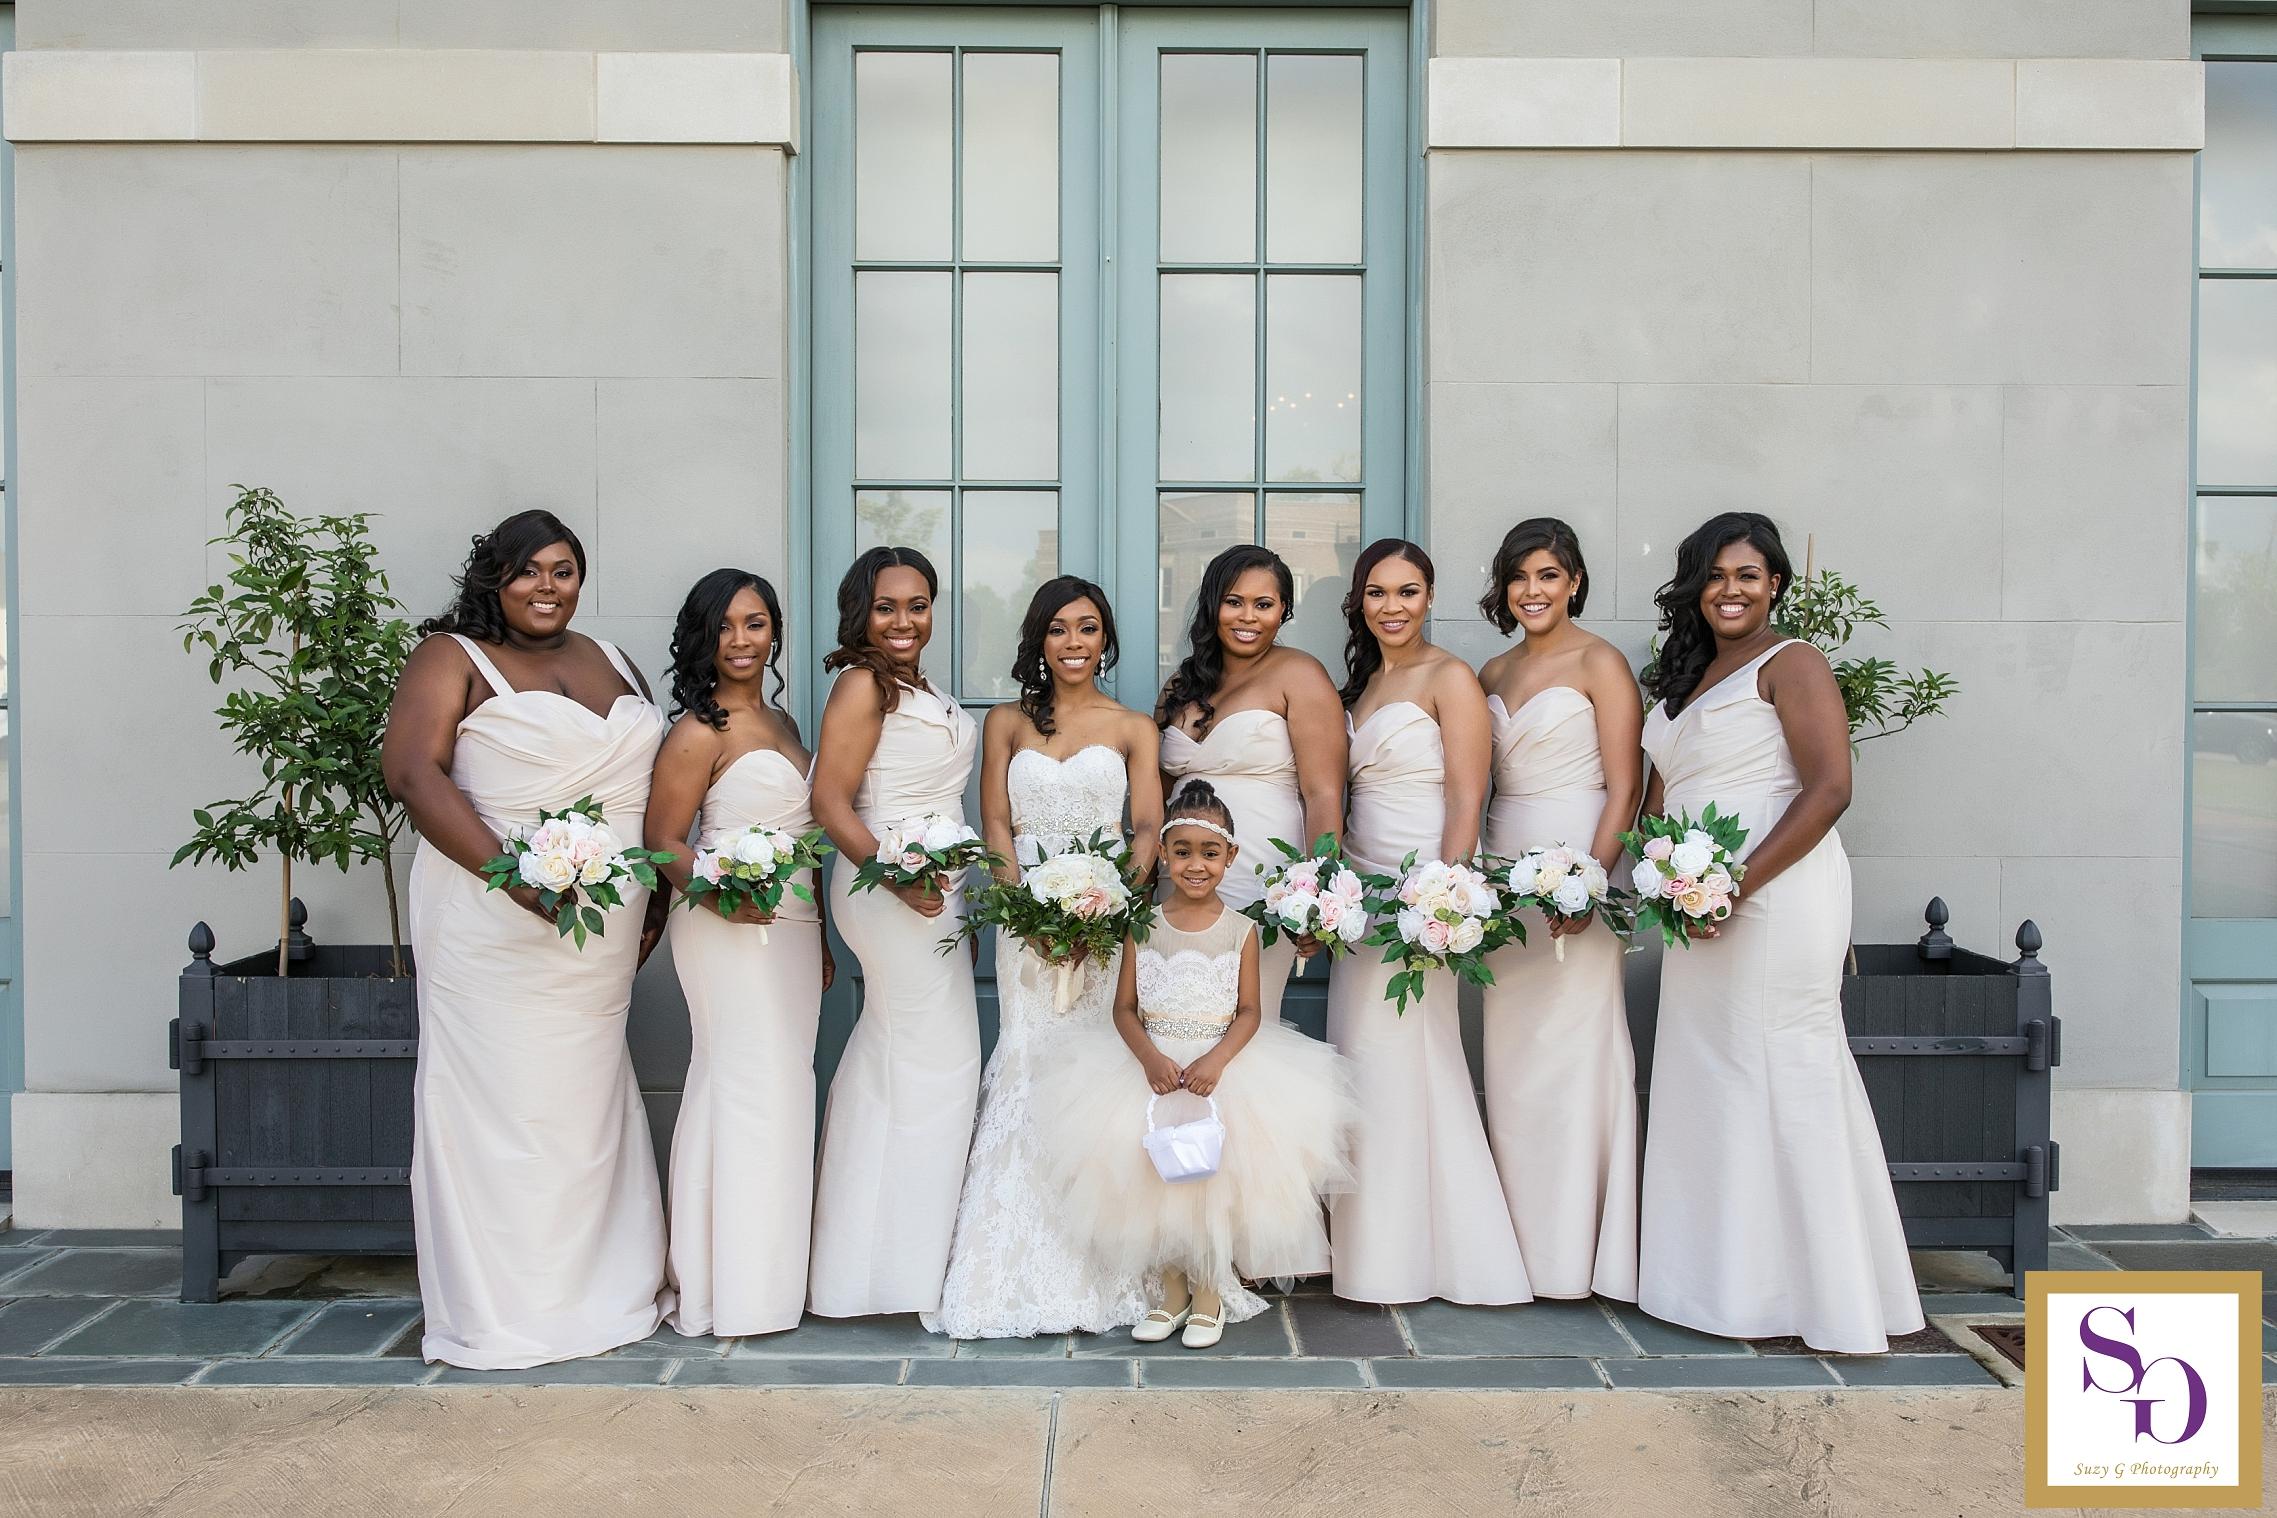 Walnut-Grove-Lake-Charles-Wedding-Wedding-Photography-Suzy-G-Photography-Suzy-G_0028.jpg